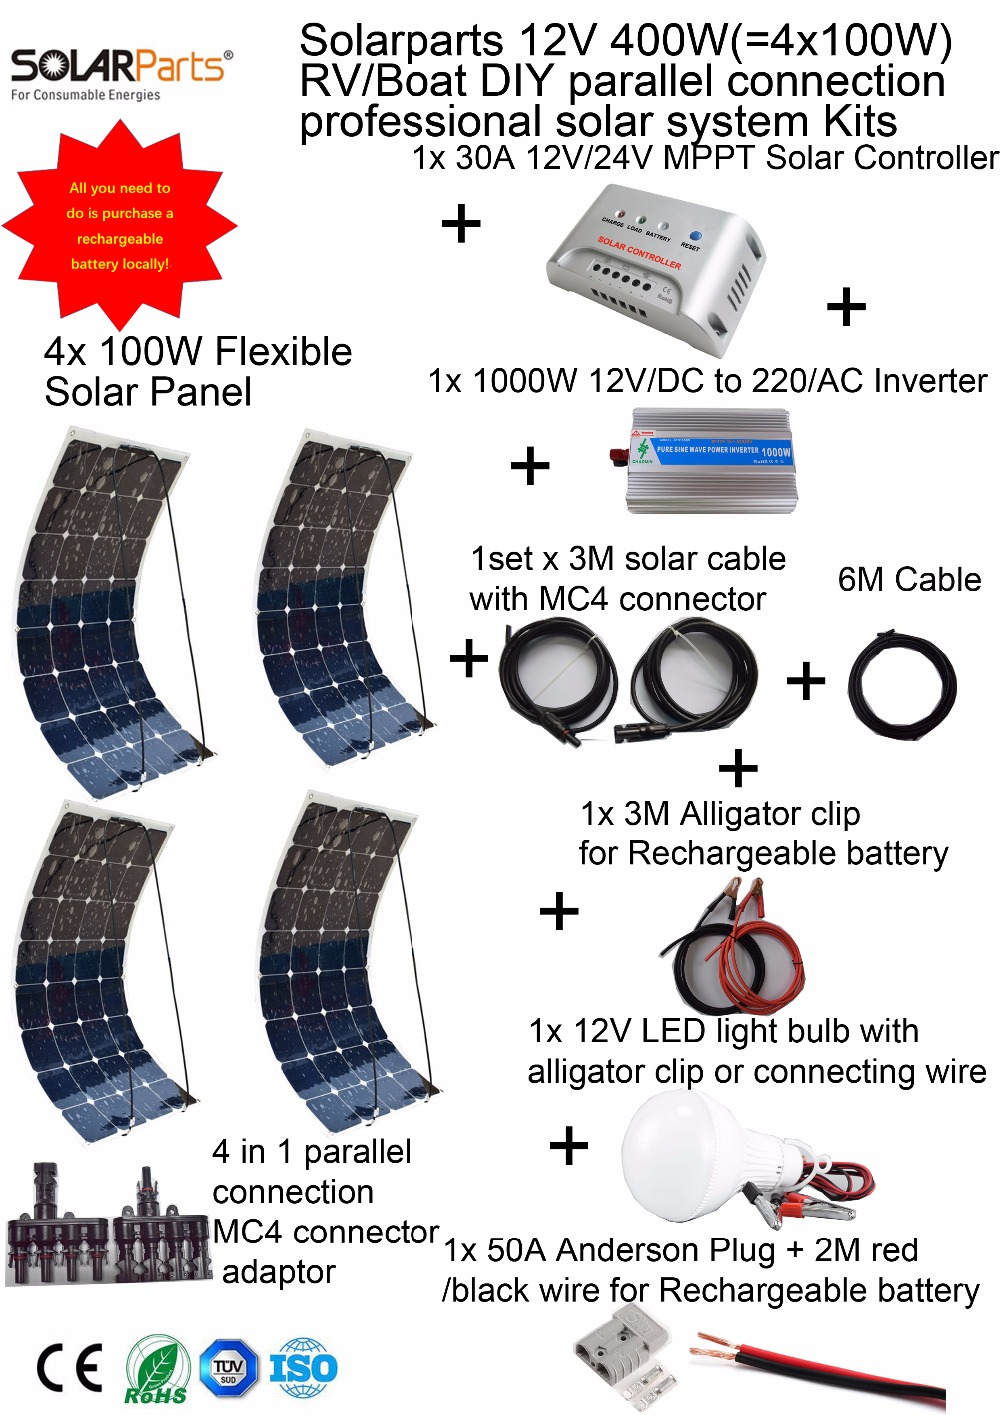 Solarparts 1x400W Professional DIY RV/Boat/Marine Kit Solar Home System 4x100W flexible solar panel MPPT controller Inverter LED(China (Mainland))